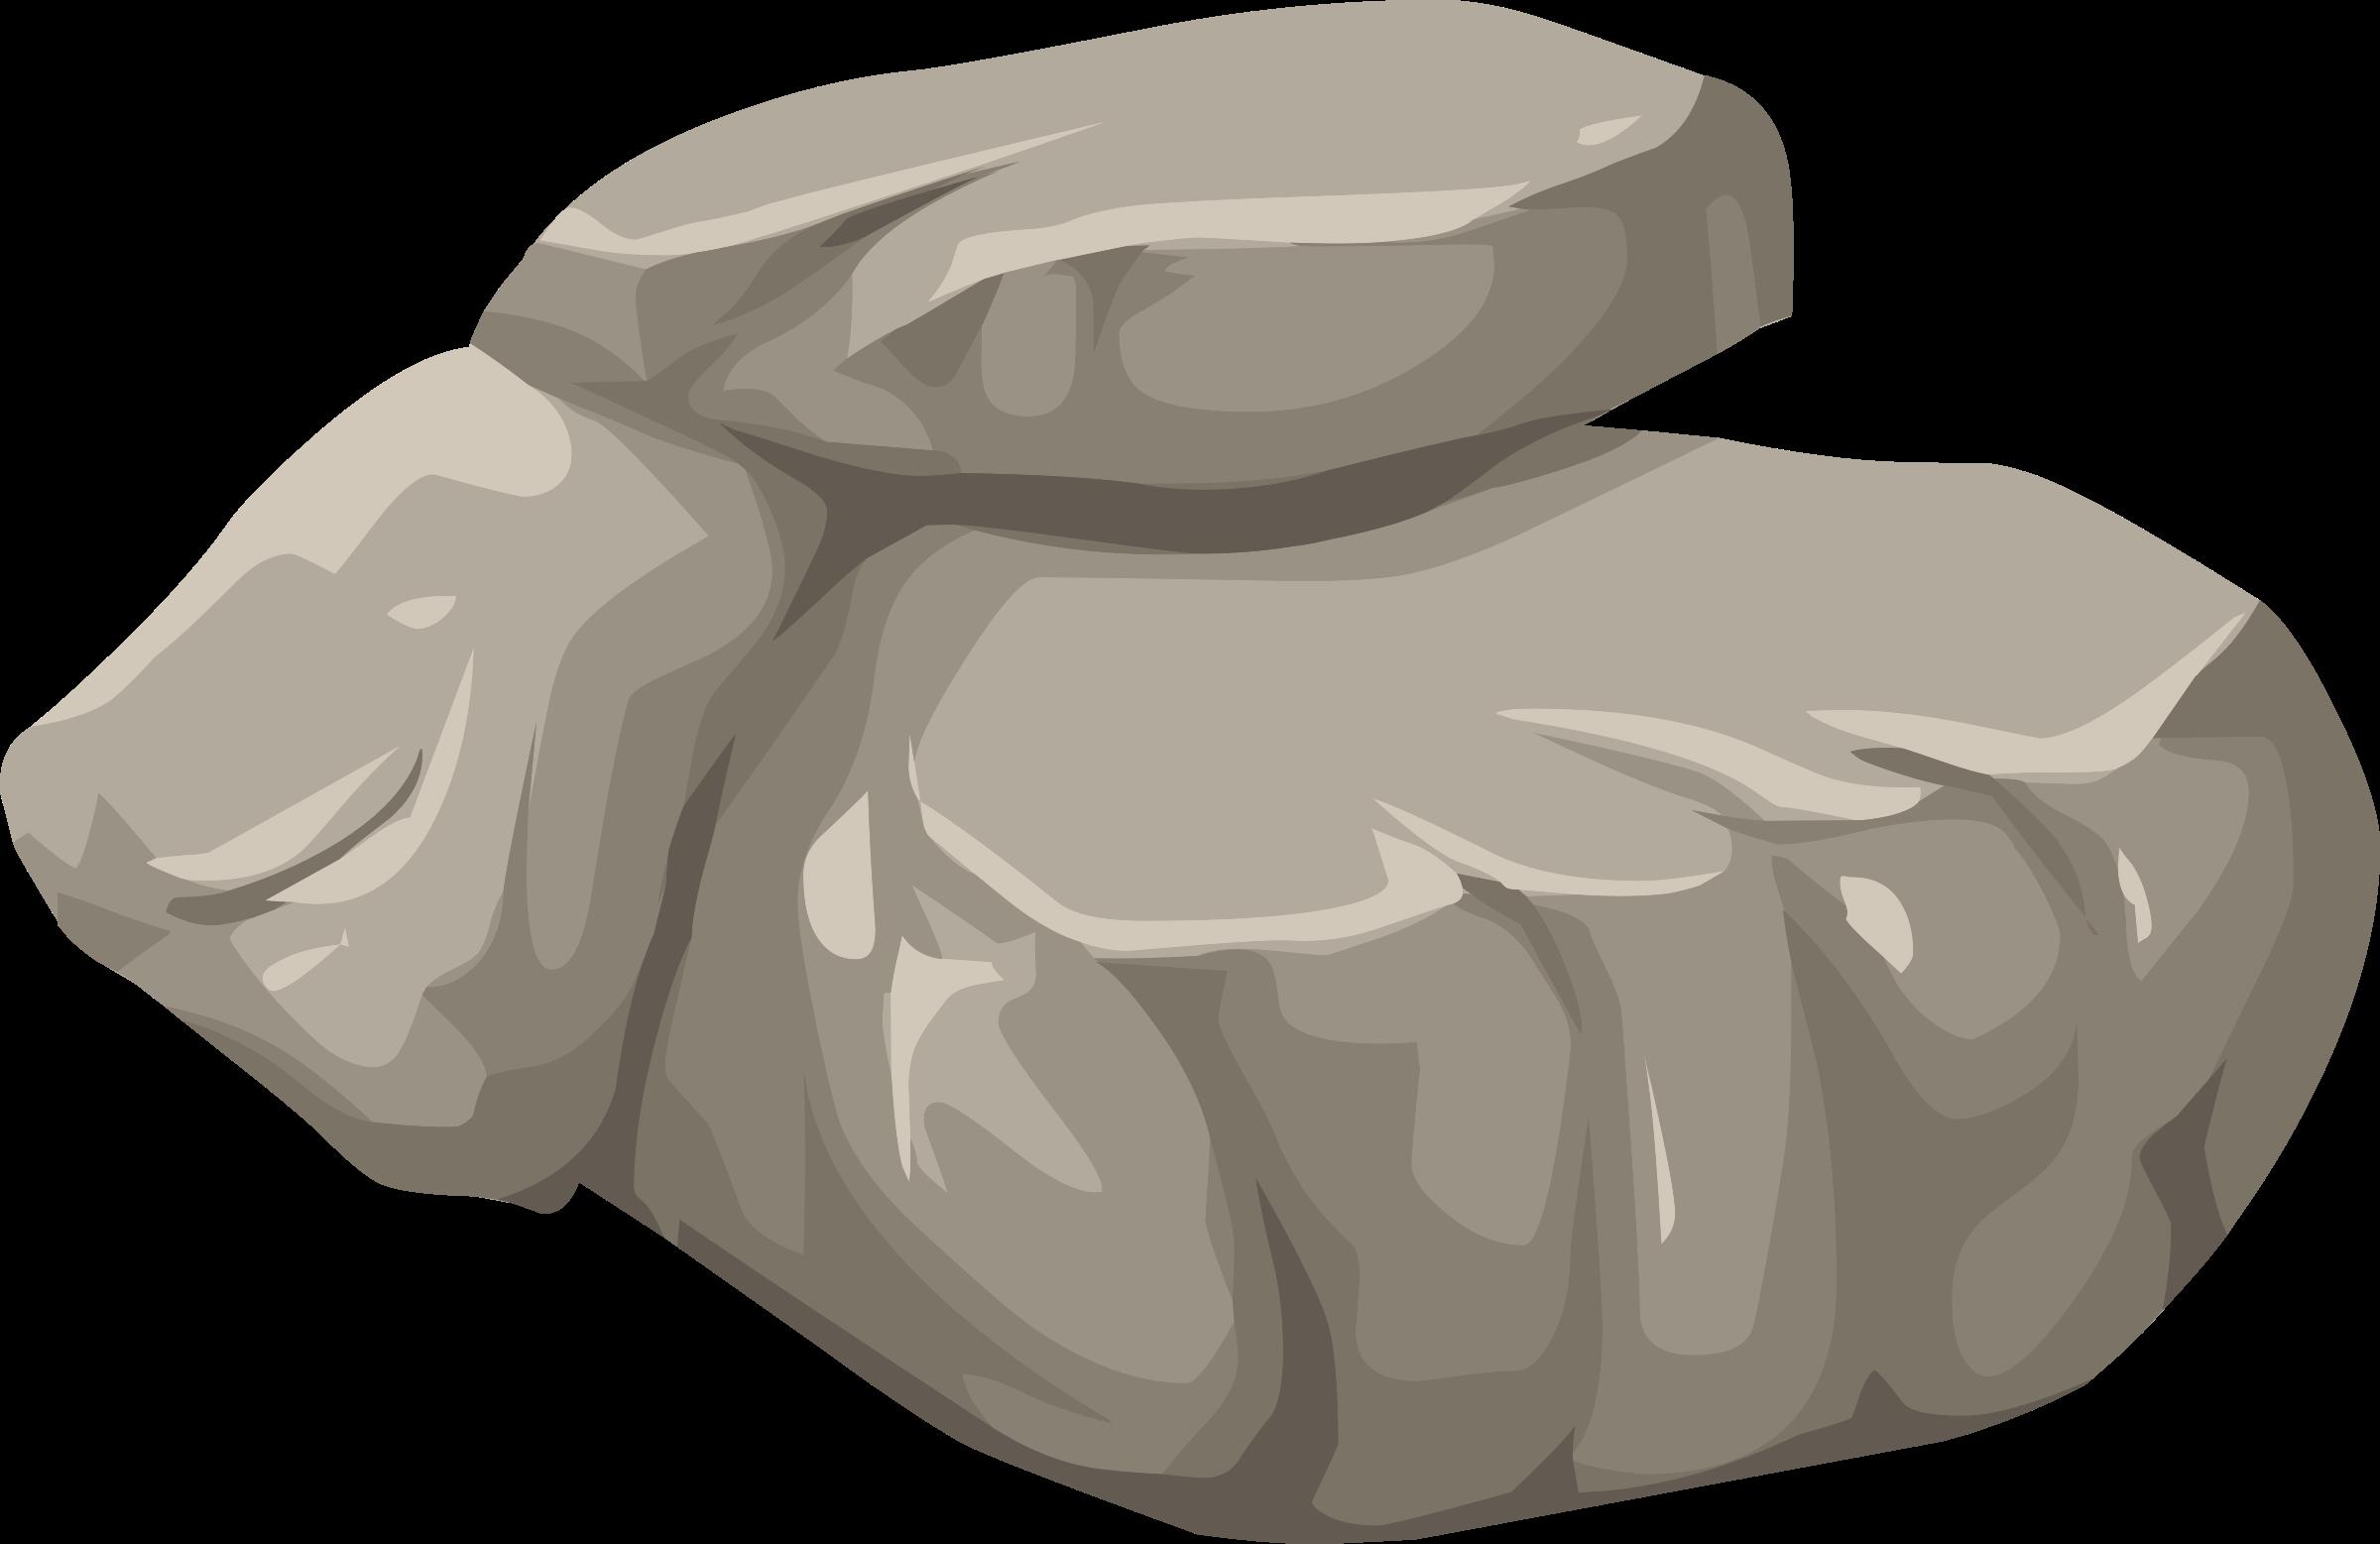 Rock transparent clipart vector freeuse Rock Clipart Png - Rock Clipart No Background , Transparent ... vector freeuse